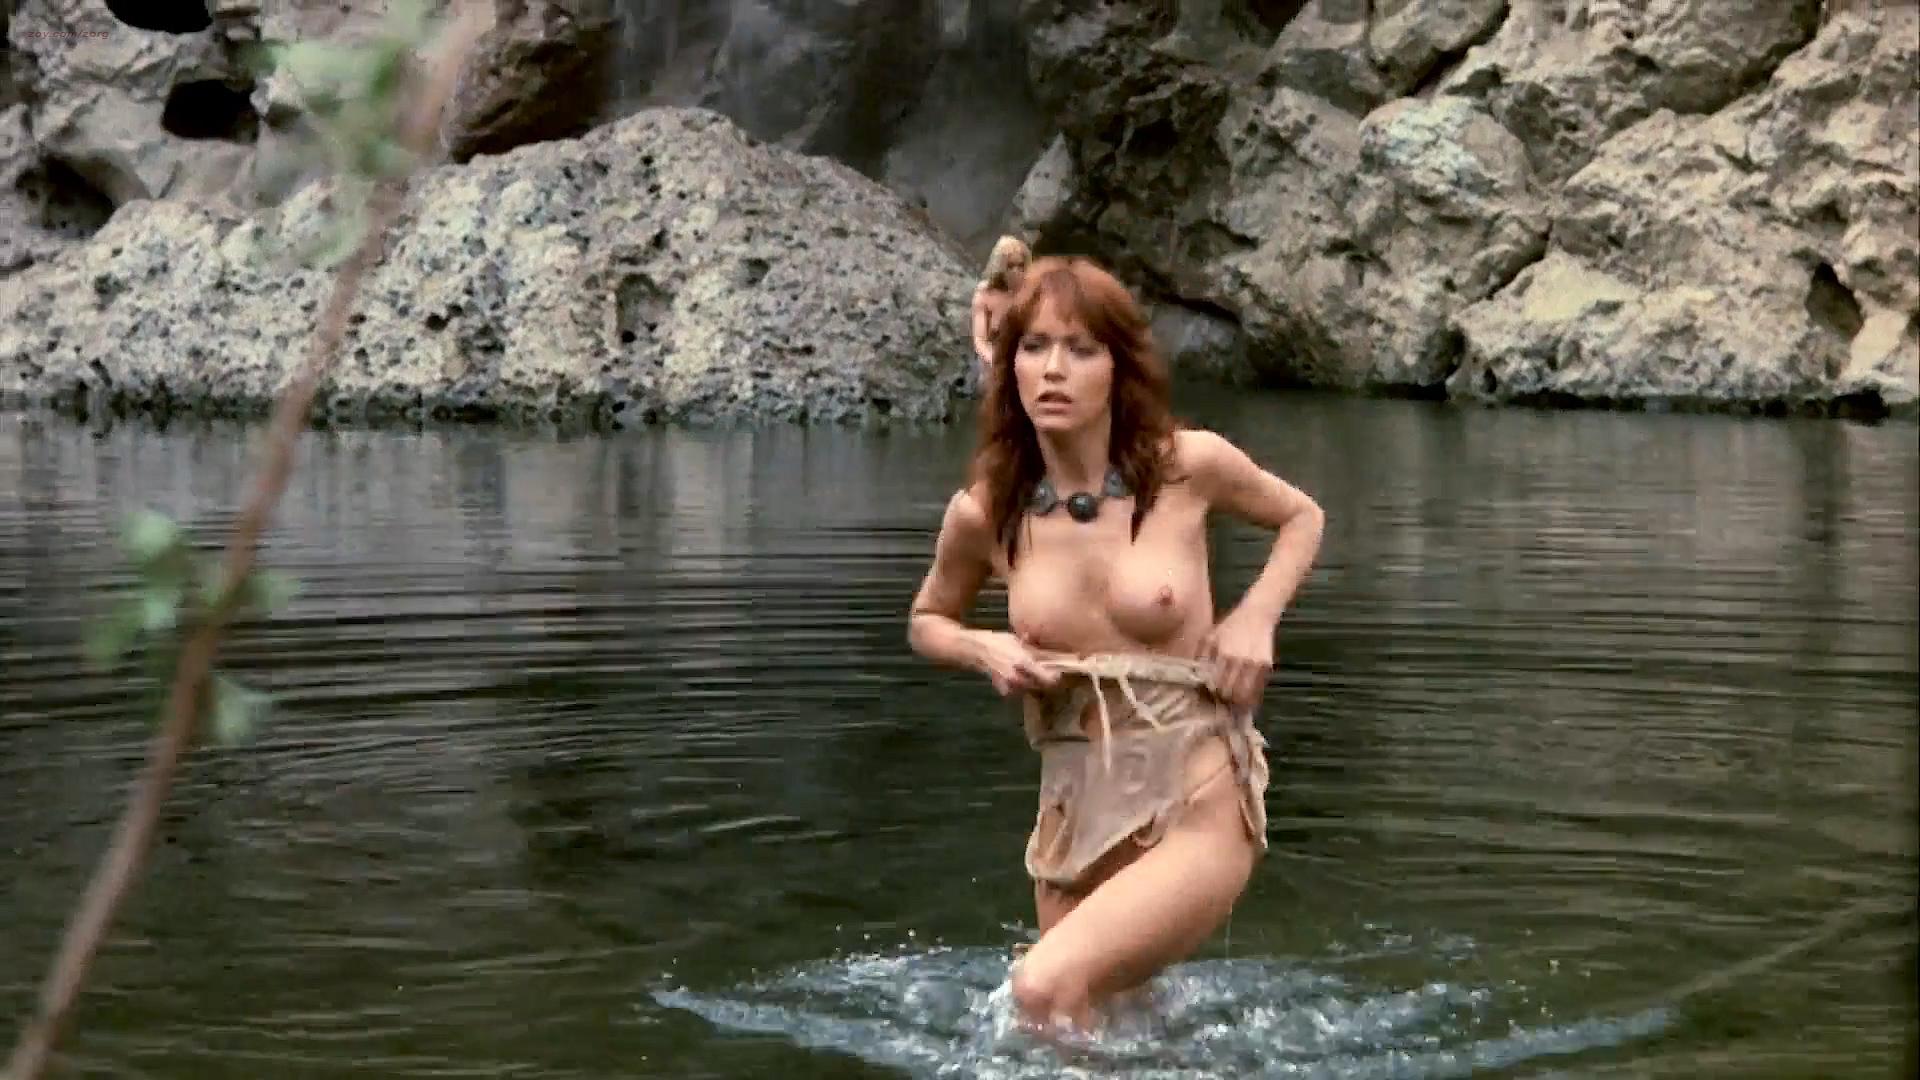 Tanya roberts topless